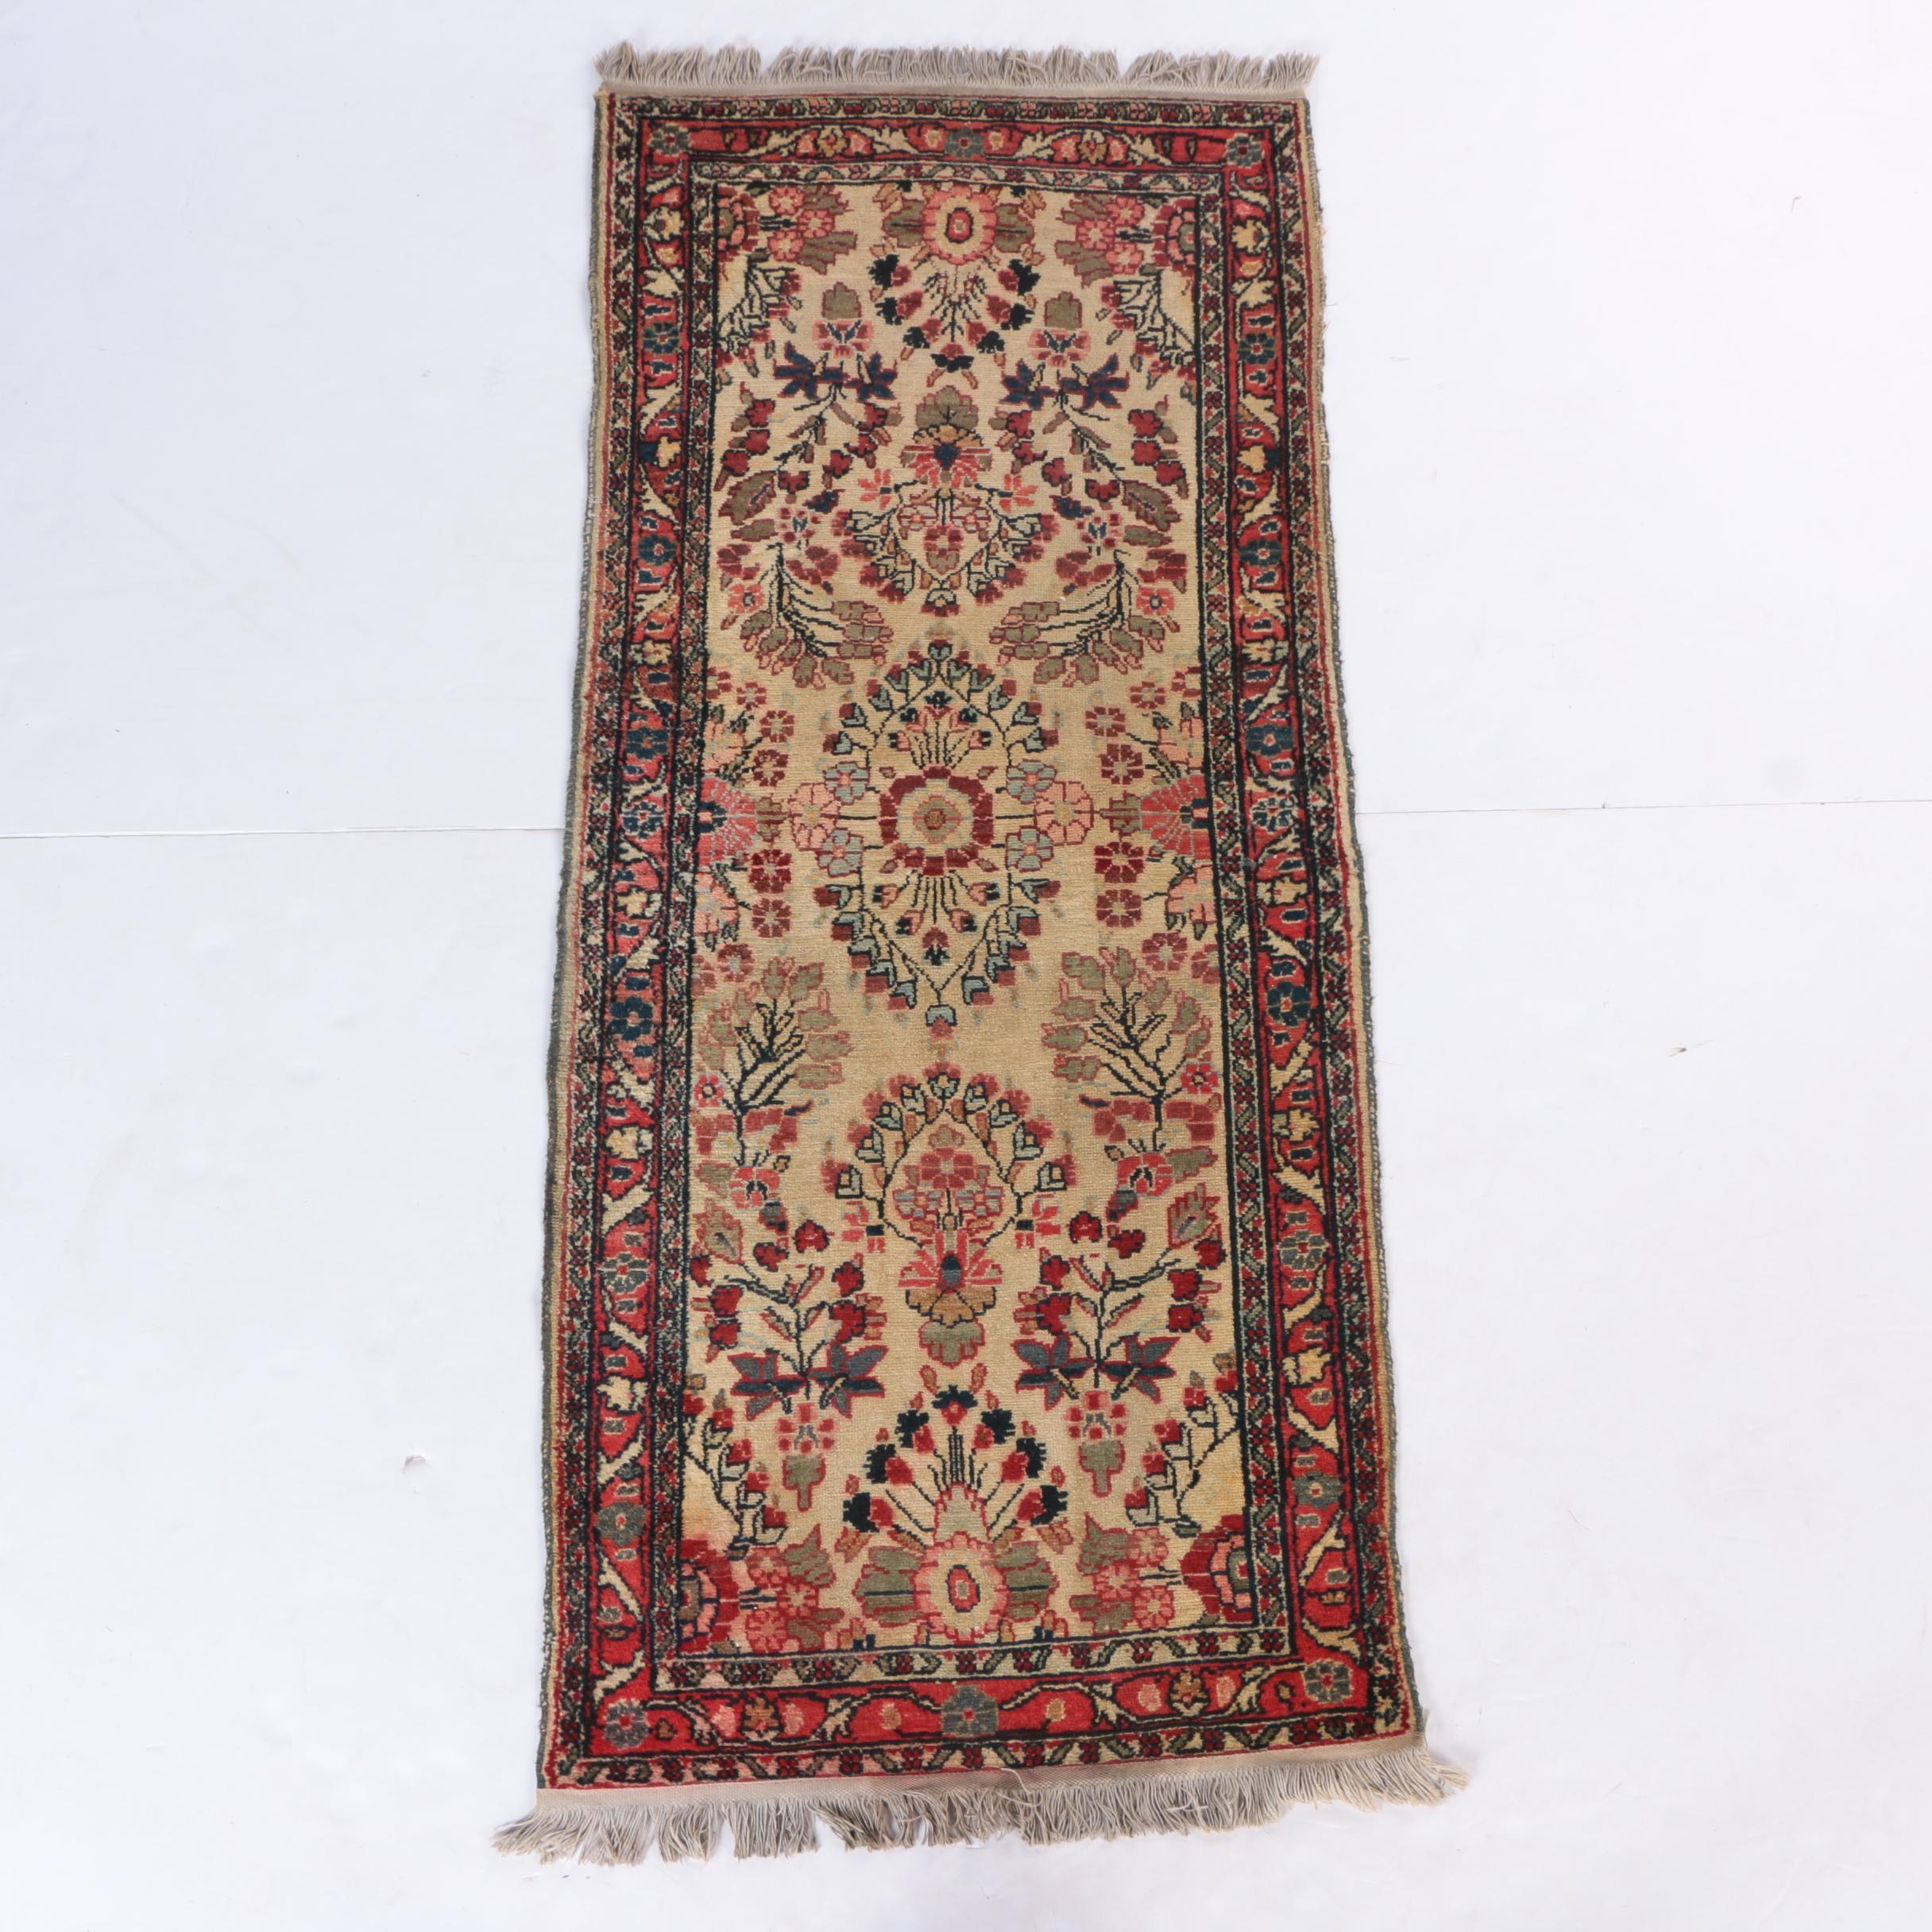 Semi-Antique Hand-Knotted Persian Sarouk Carpet Runner